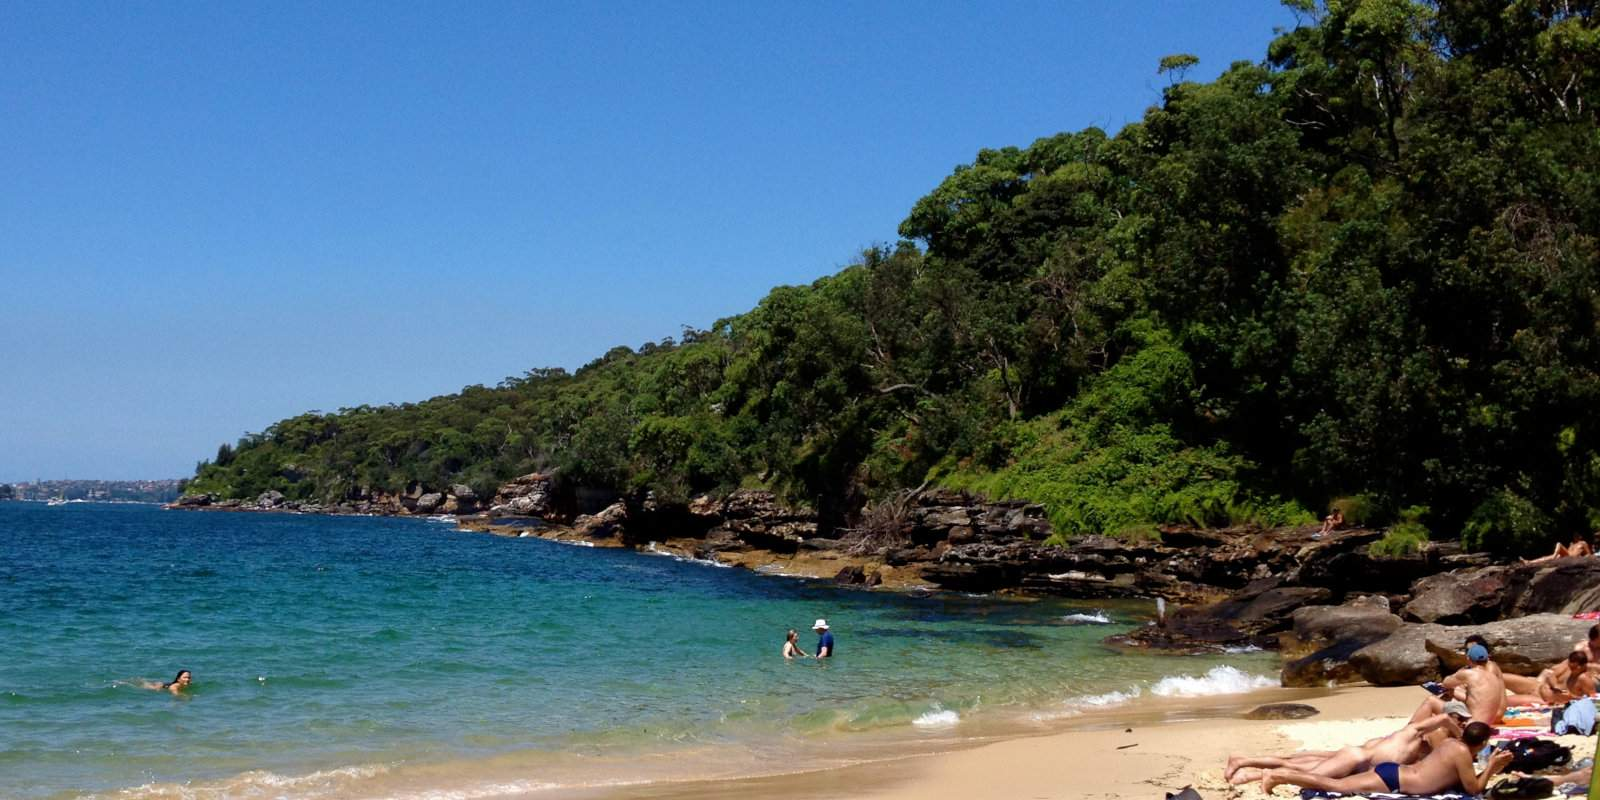 Obelisk Beach is Sydney's best gay nude beach for enjoying the Aussie sun!